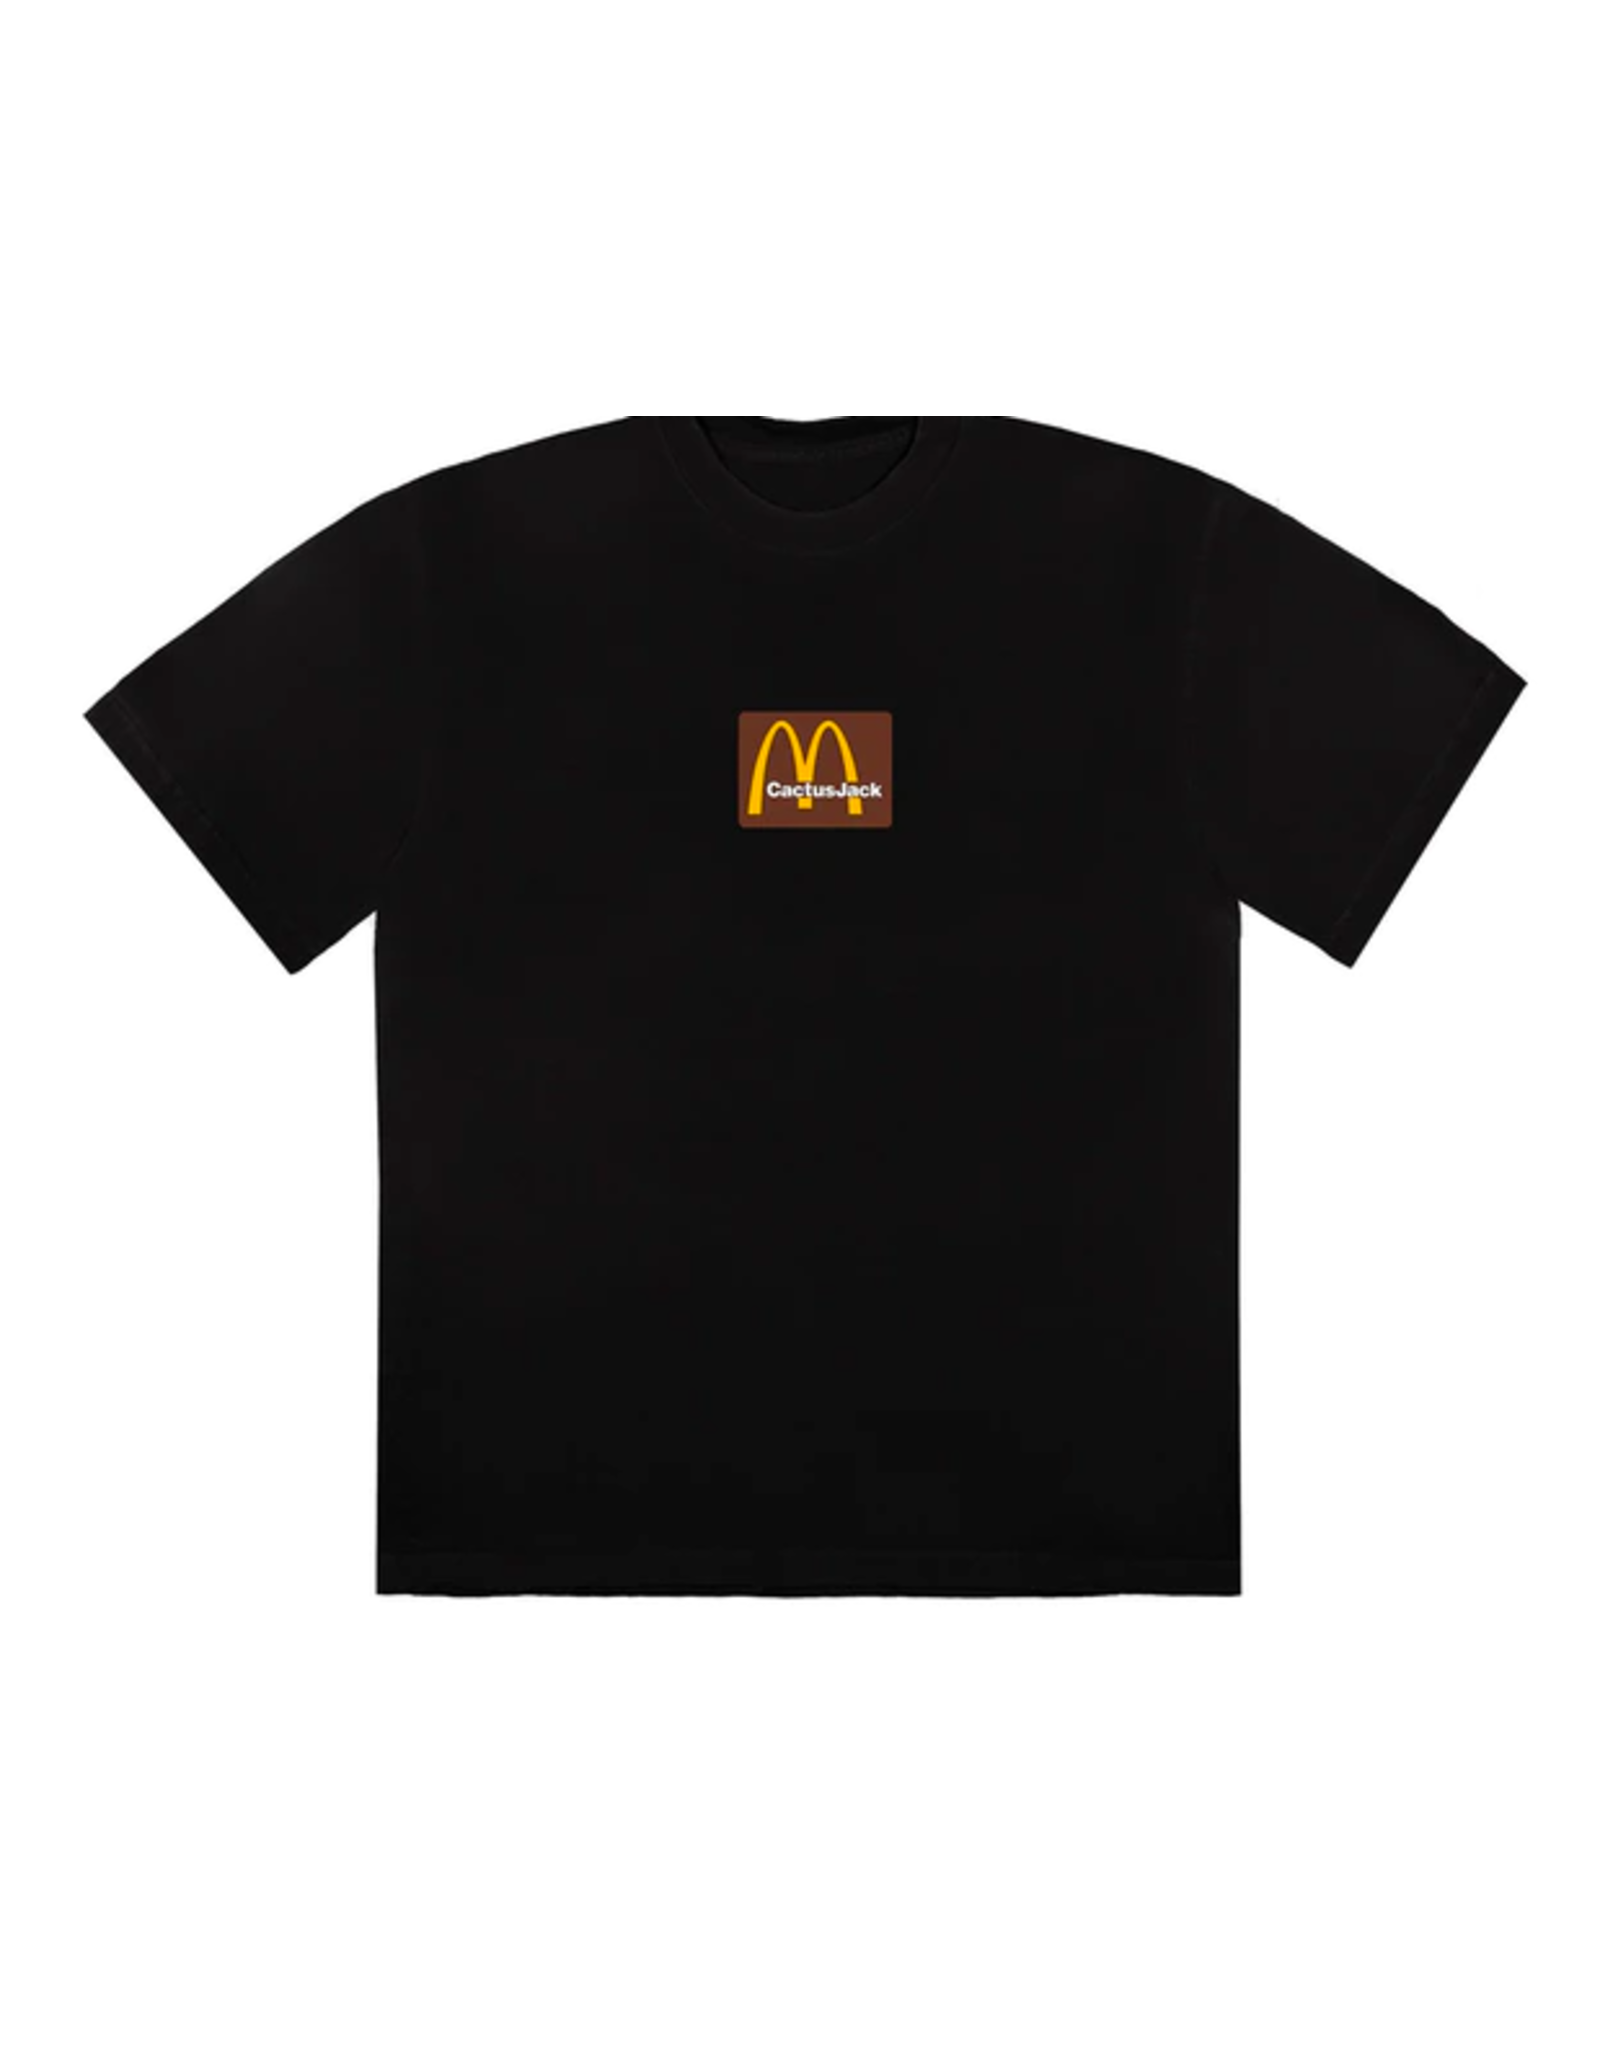 TRAVIS SCOTT Travis Scott x McDonald's Sesame Inv T-Shirt Black/Brown